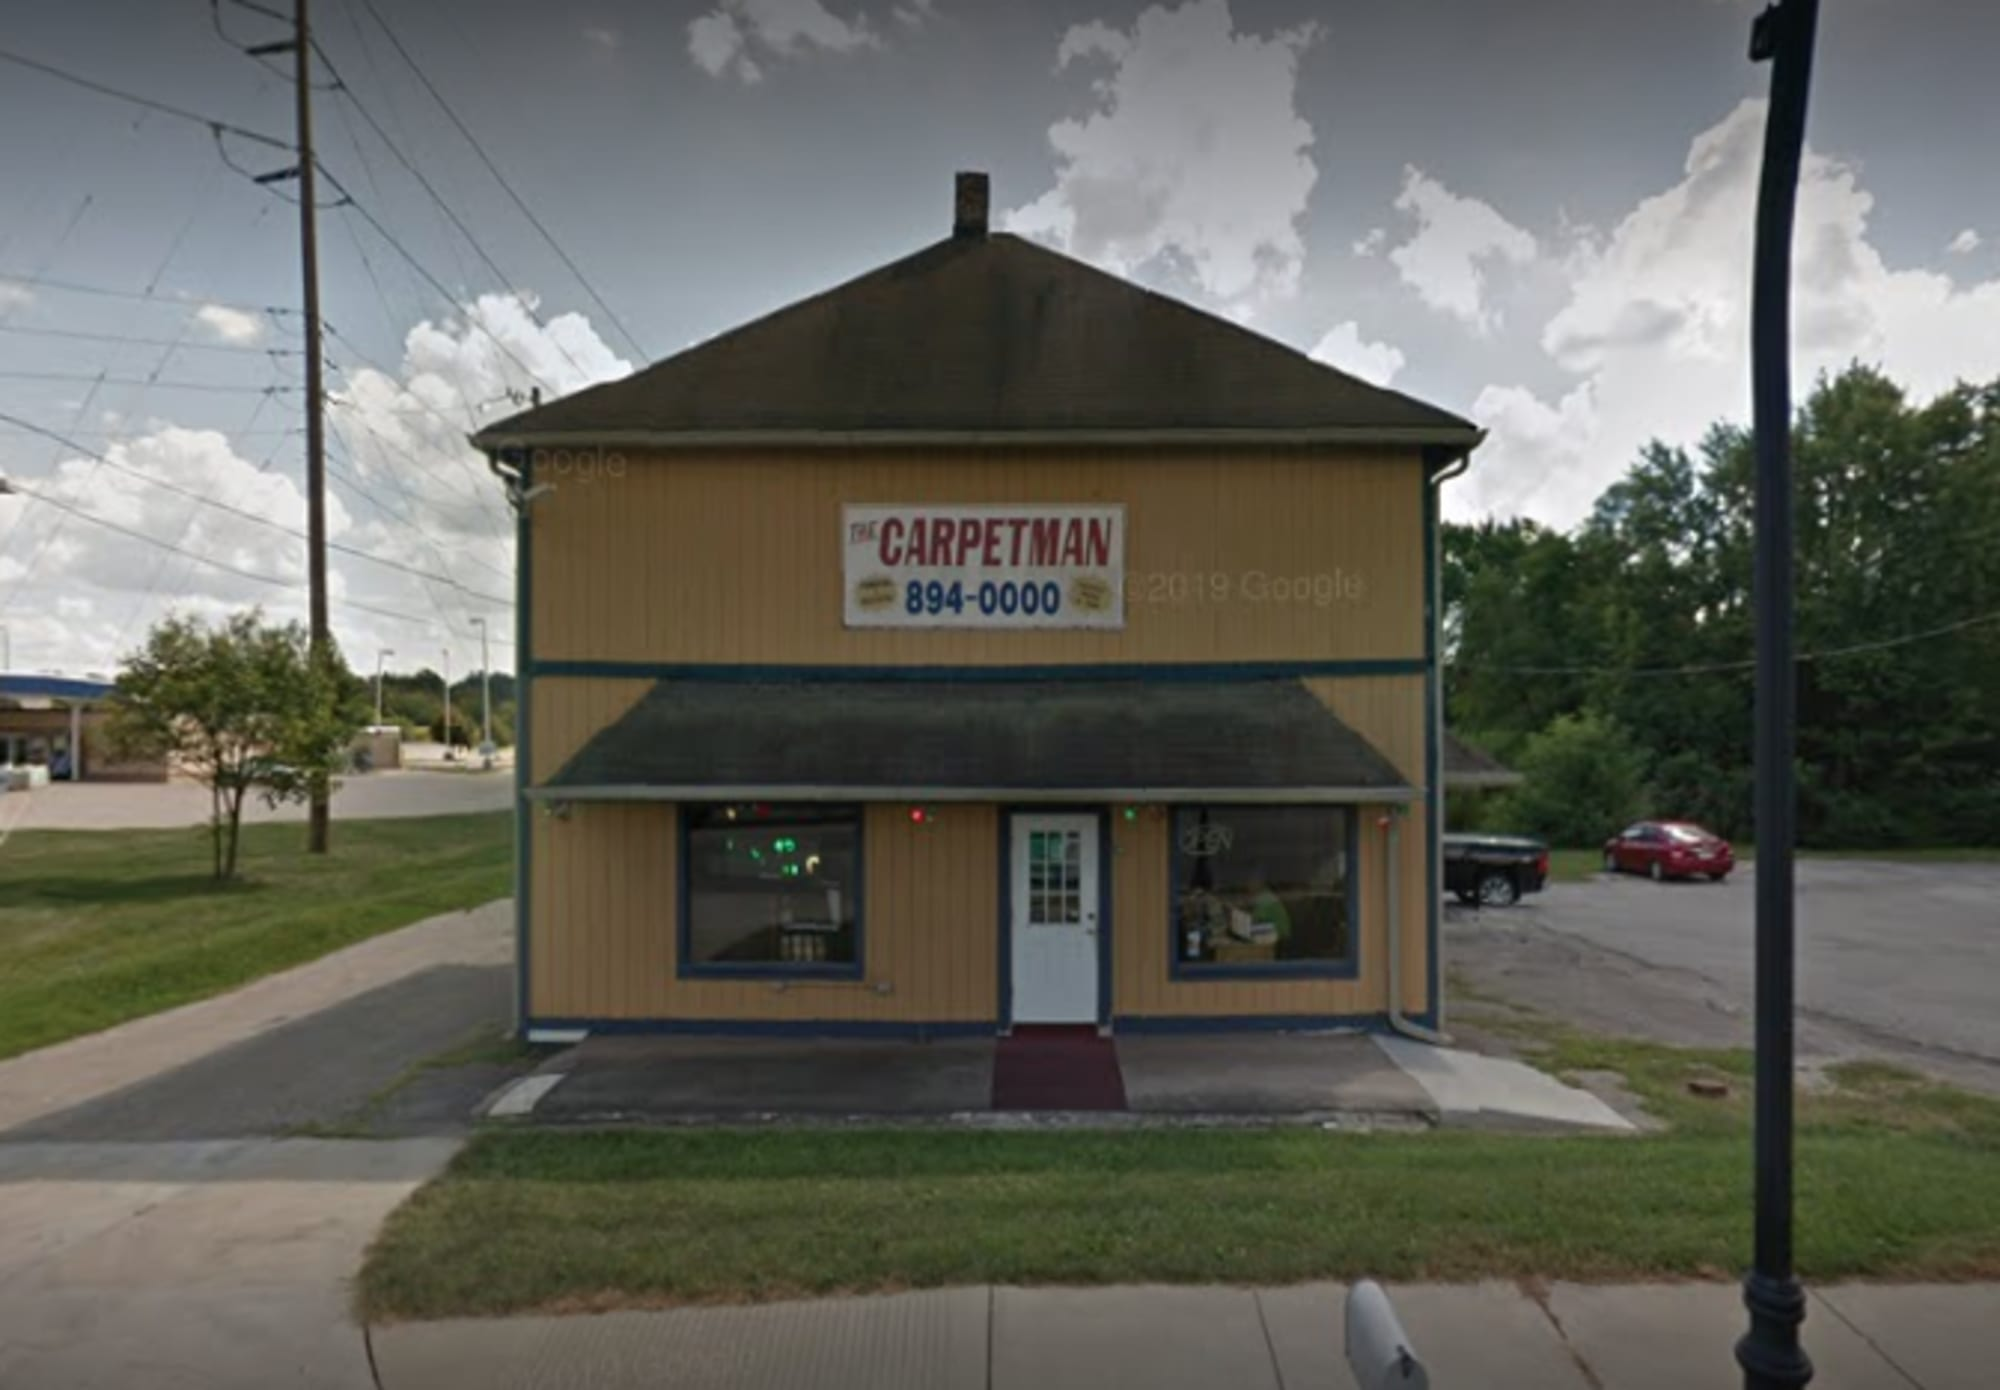 The Carpet Man Indy  - 11209 E Washington St Indianapolis, IN 46229